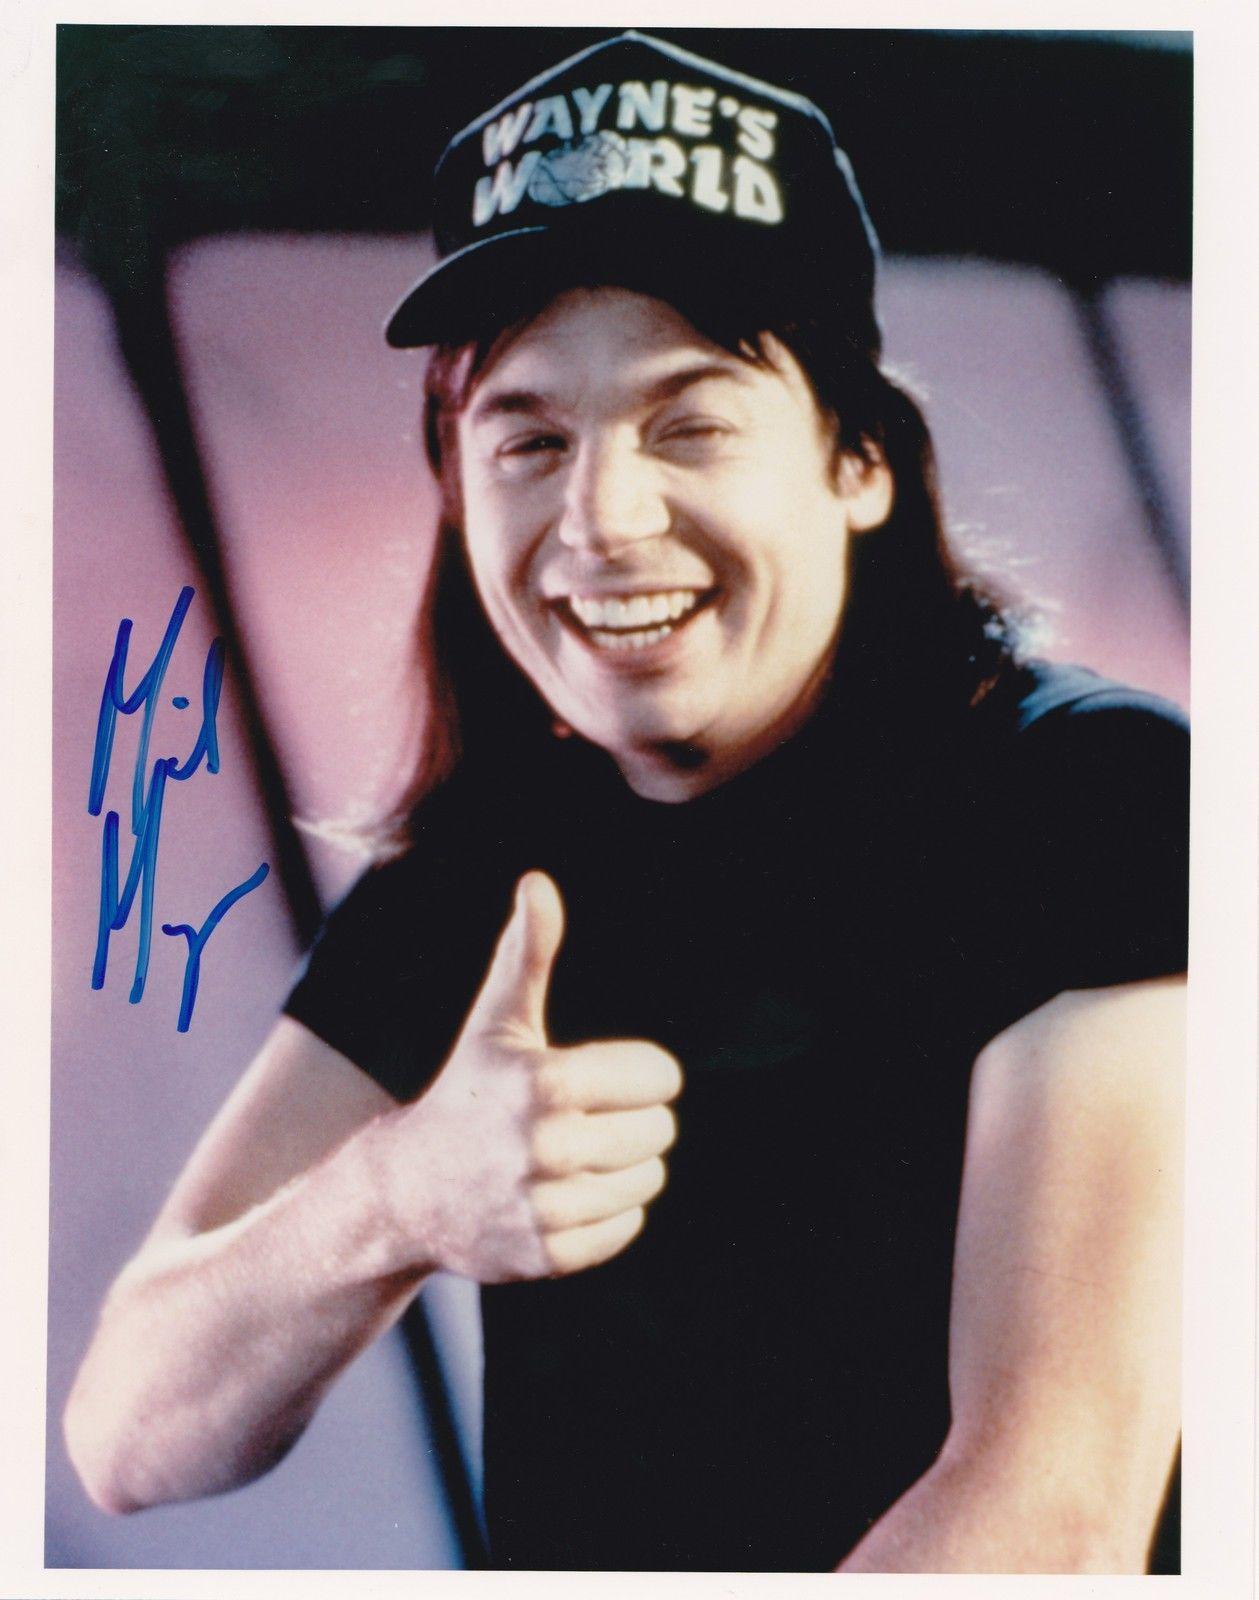 Signed Myers Picture - 8x10 Waynes World Snl Austin Powers Coa